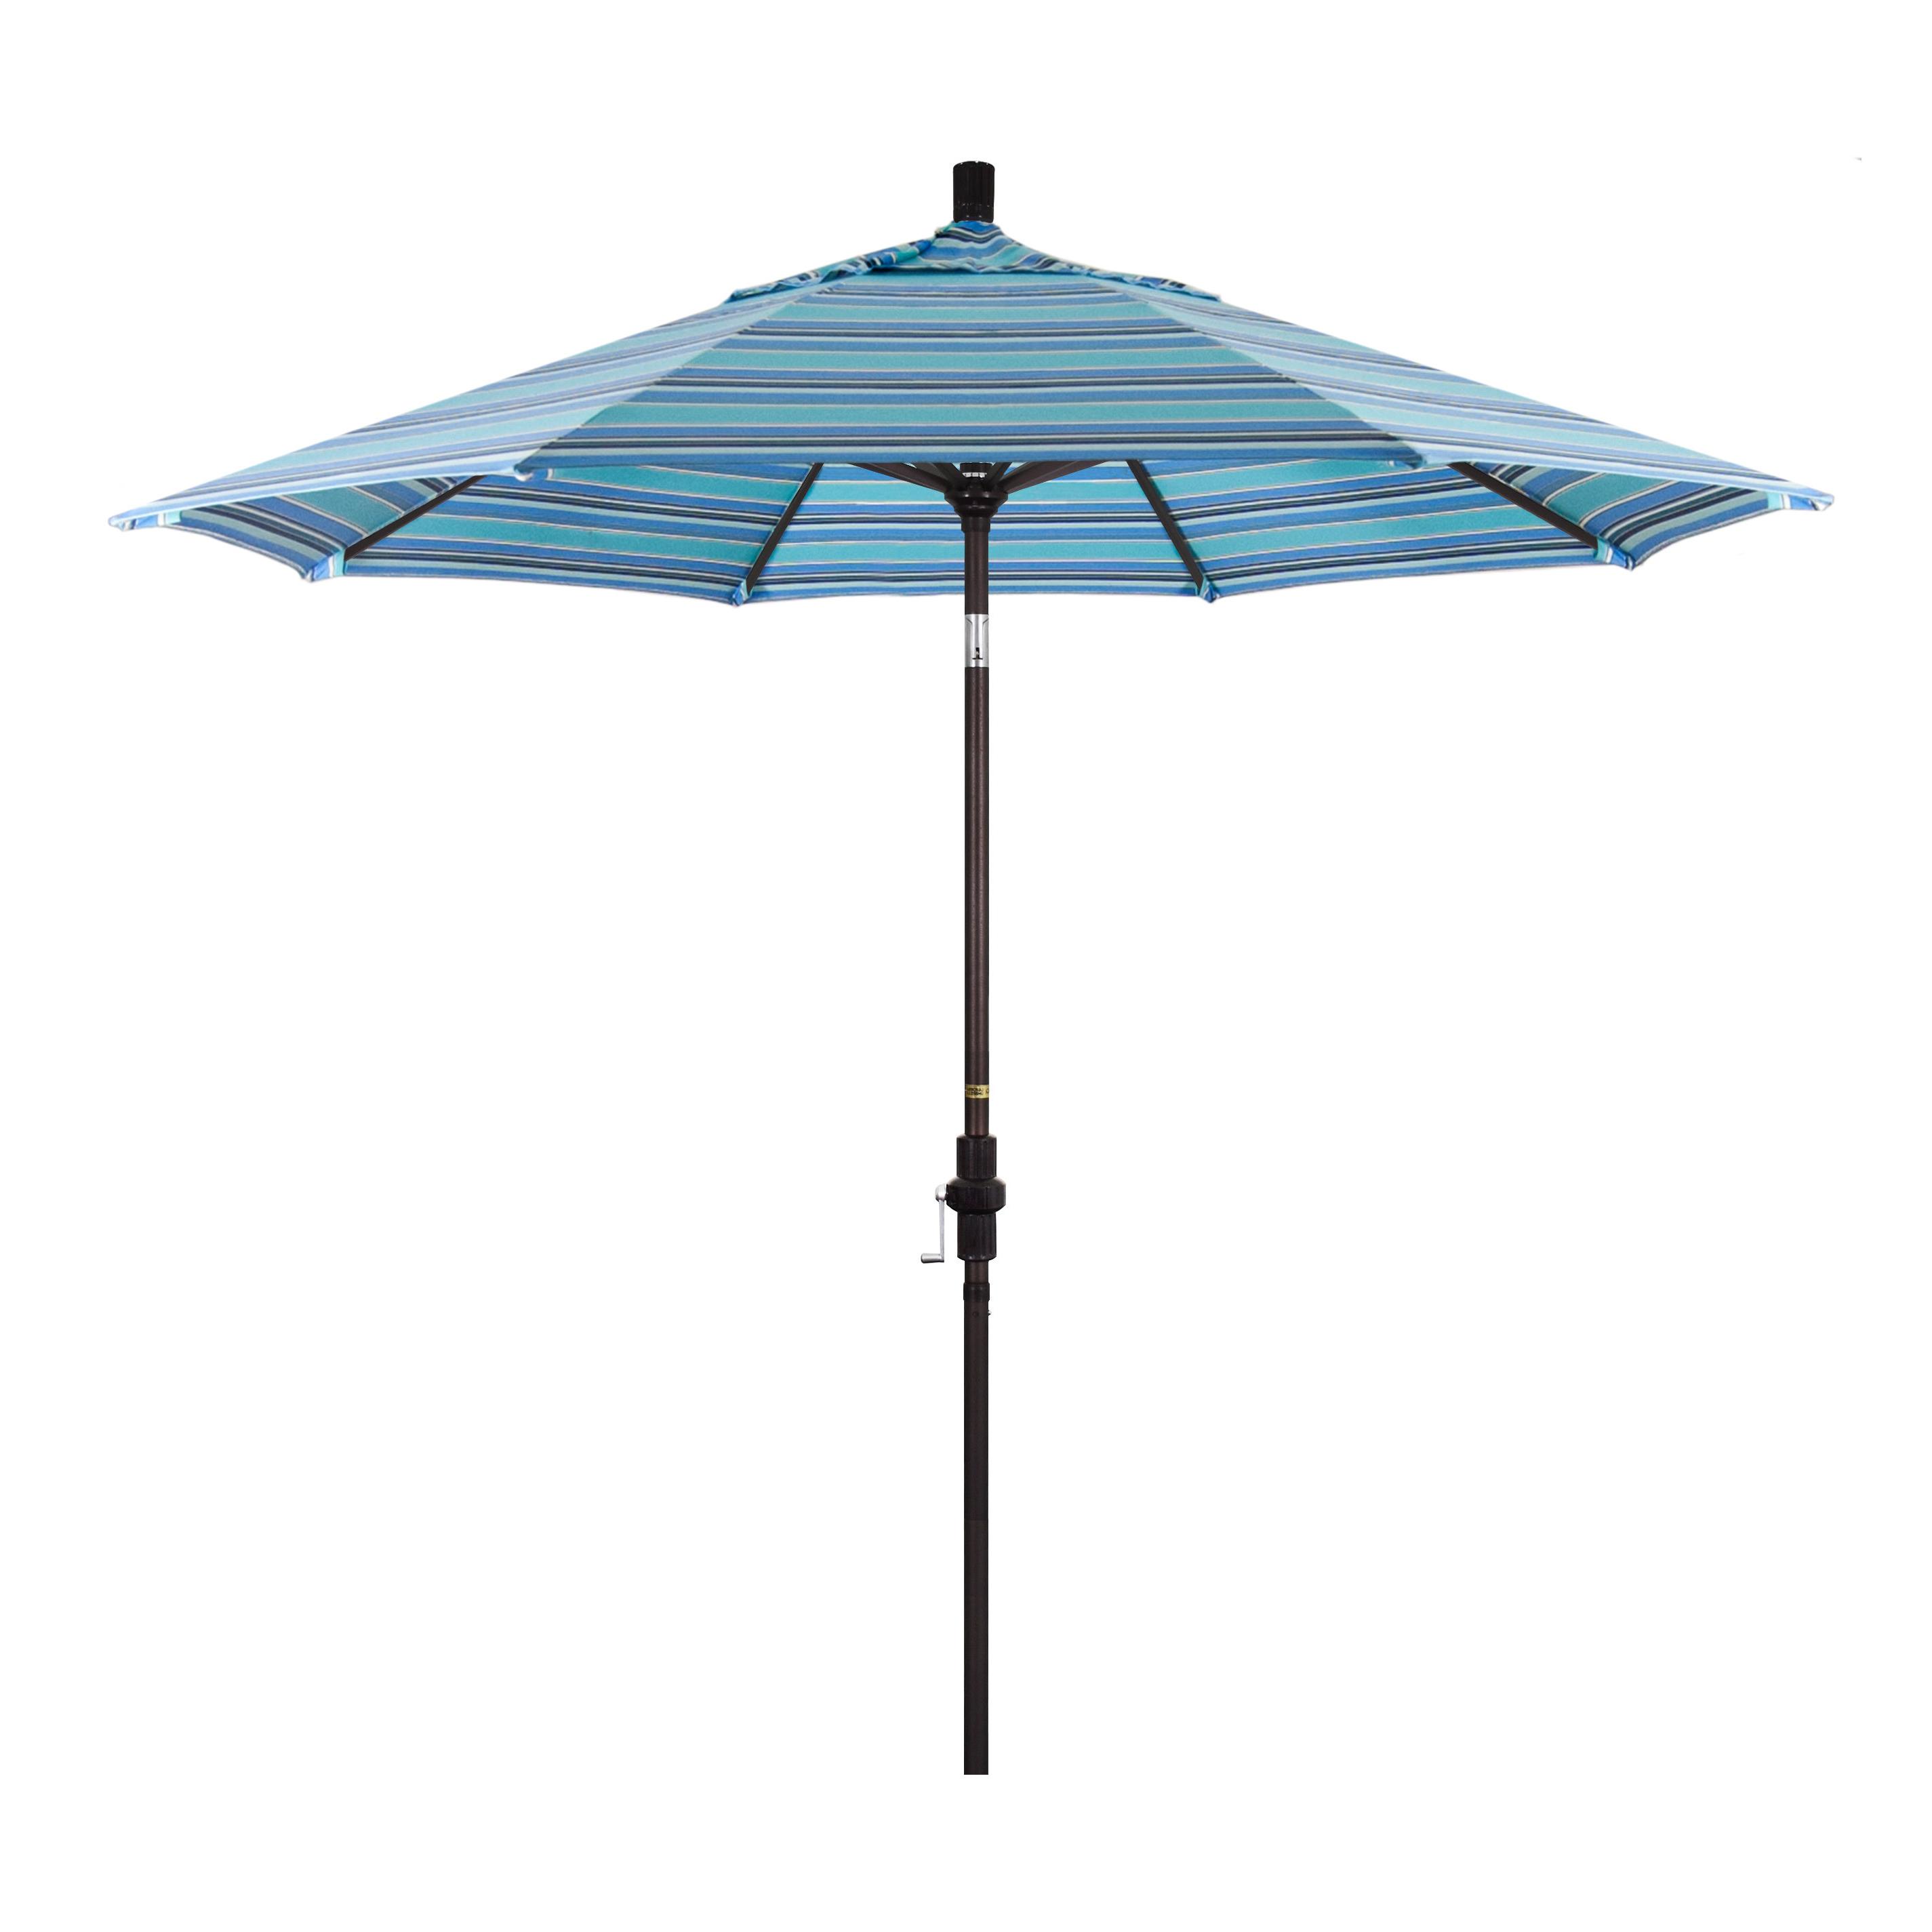 Newest Golden State Series 9' Market Sunbrella Umbrella For Caravelle Market Sunbrella Umbrellas (Gallery 6 of 20)